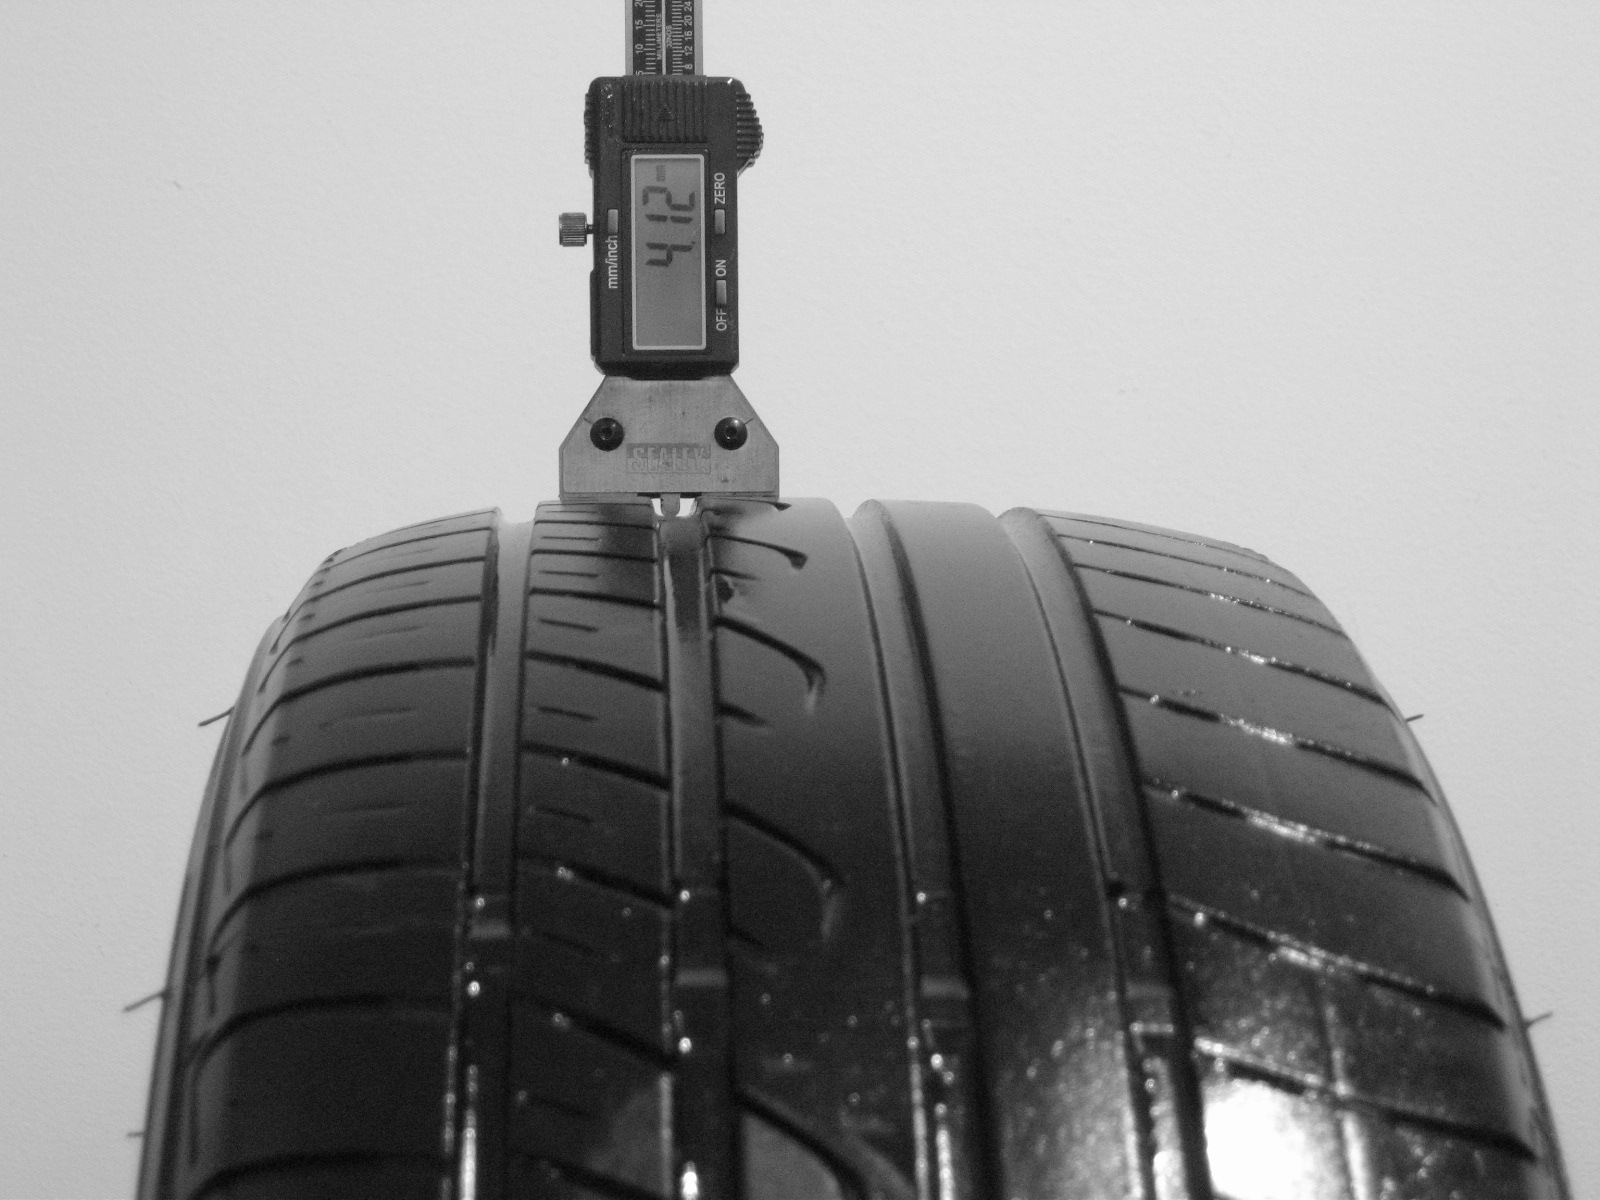 Použité-Pneu-Bazar - 205/55 R16 YOKOHAMA C.DRIVE -kusovka-rezerva 3mm